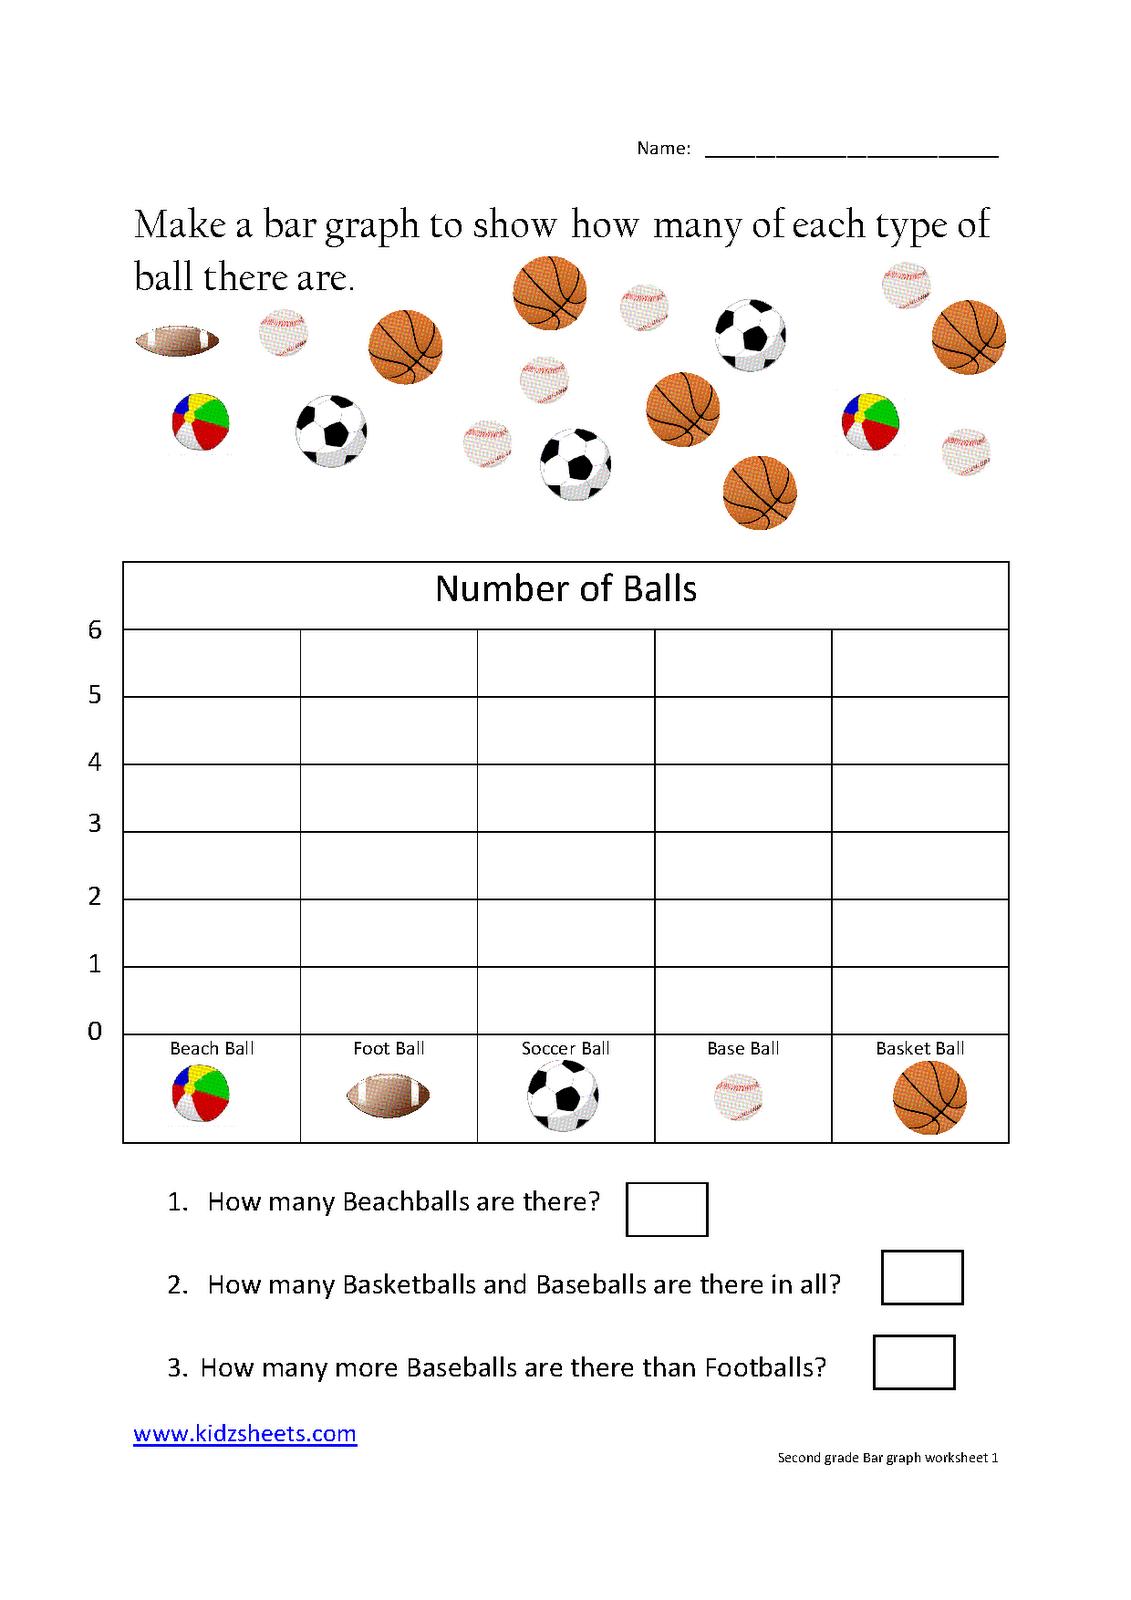 Kidz Worksheets: Second Grade Bar Graph Worksheet1 | School | Kids - Printable Graphing Puzzles